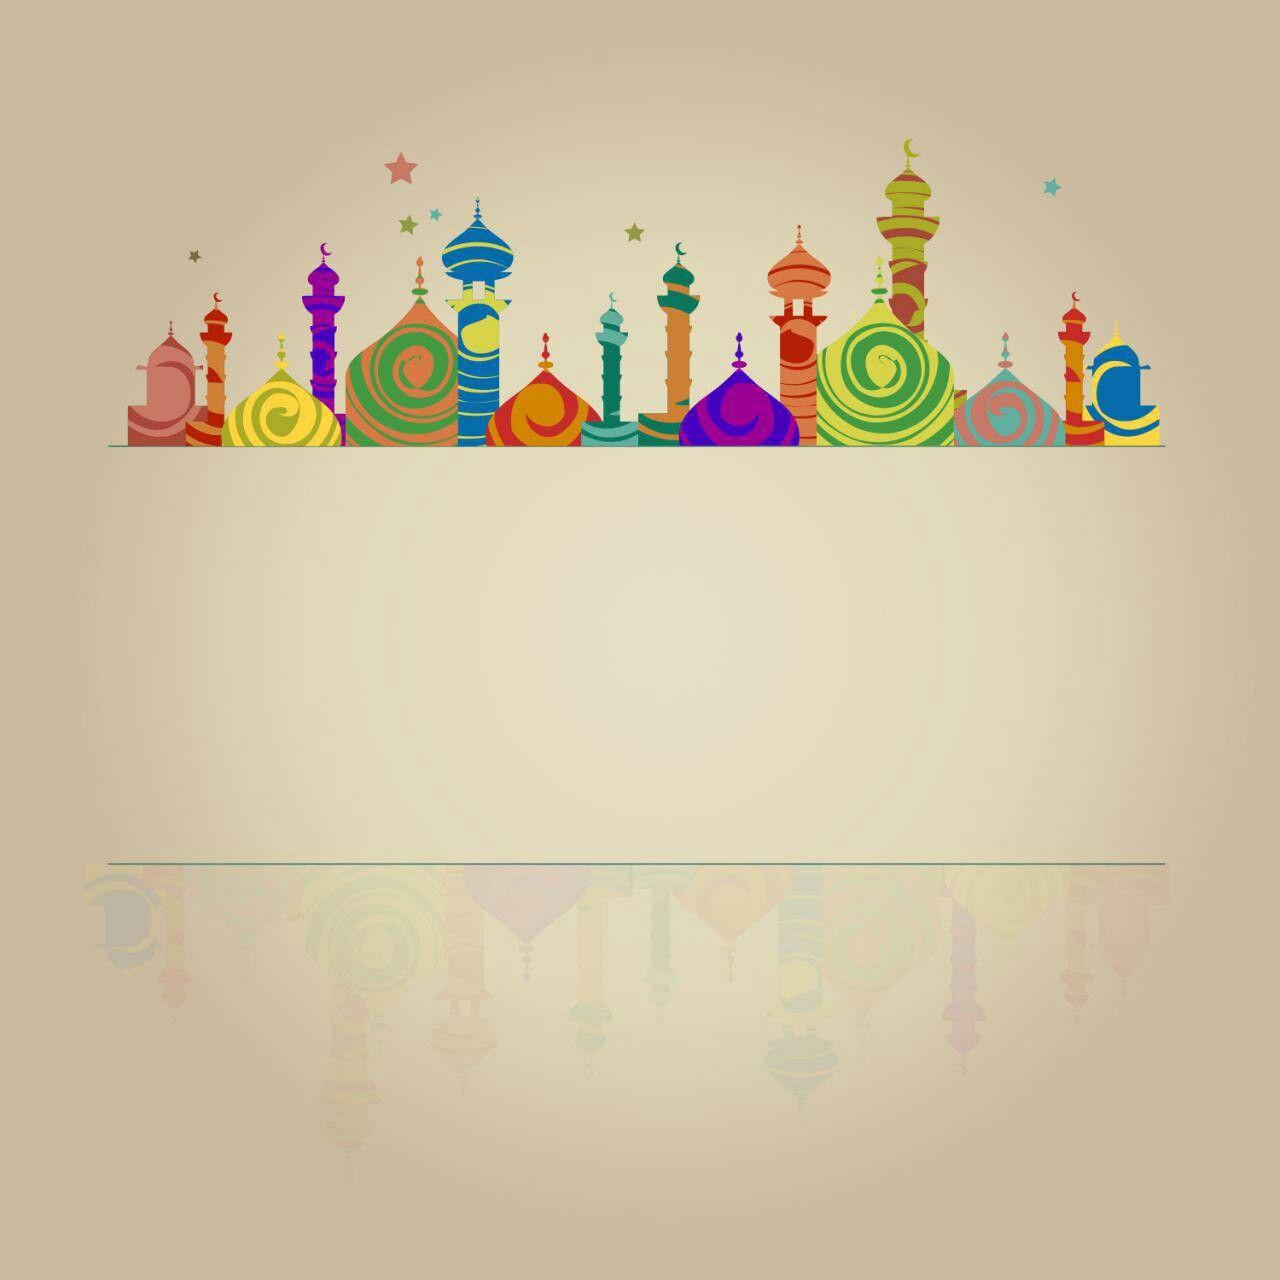 Festival Seni Islamis Desain Banner Seni